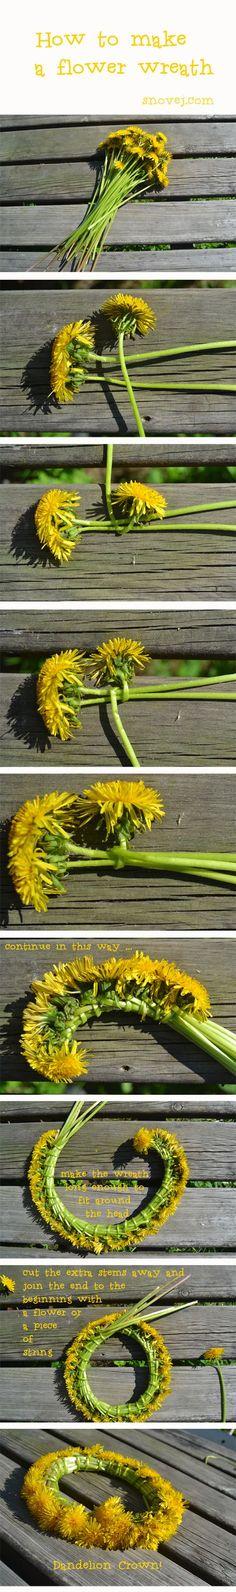 DIY Fresh Flower Heart Wreath is part of Diy flower crown - Diy Flower Crown, Flower Crowns, Diy Flowers, Flower Crown Drawing, Daisy Crown, Diy Crafts Hacks, Cute Crafts, Diys, Fleurs Diy